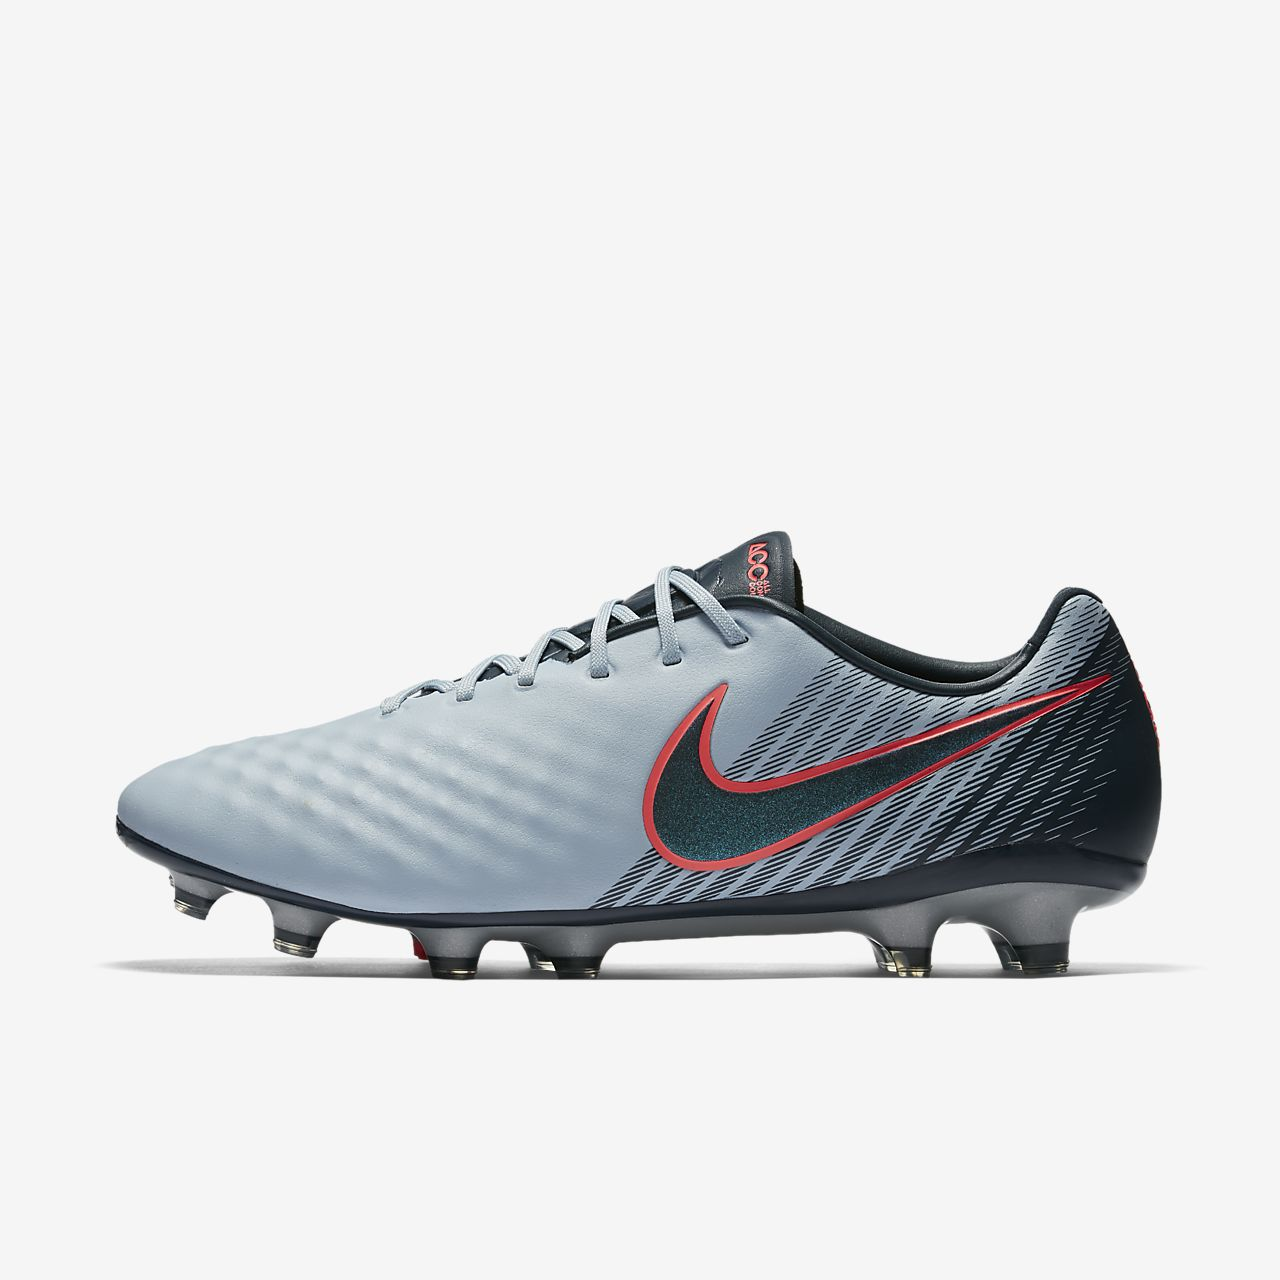 ... Nike Magista Opus II Firm-Ground Football Boot